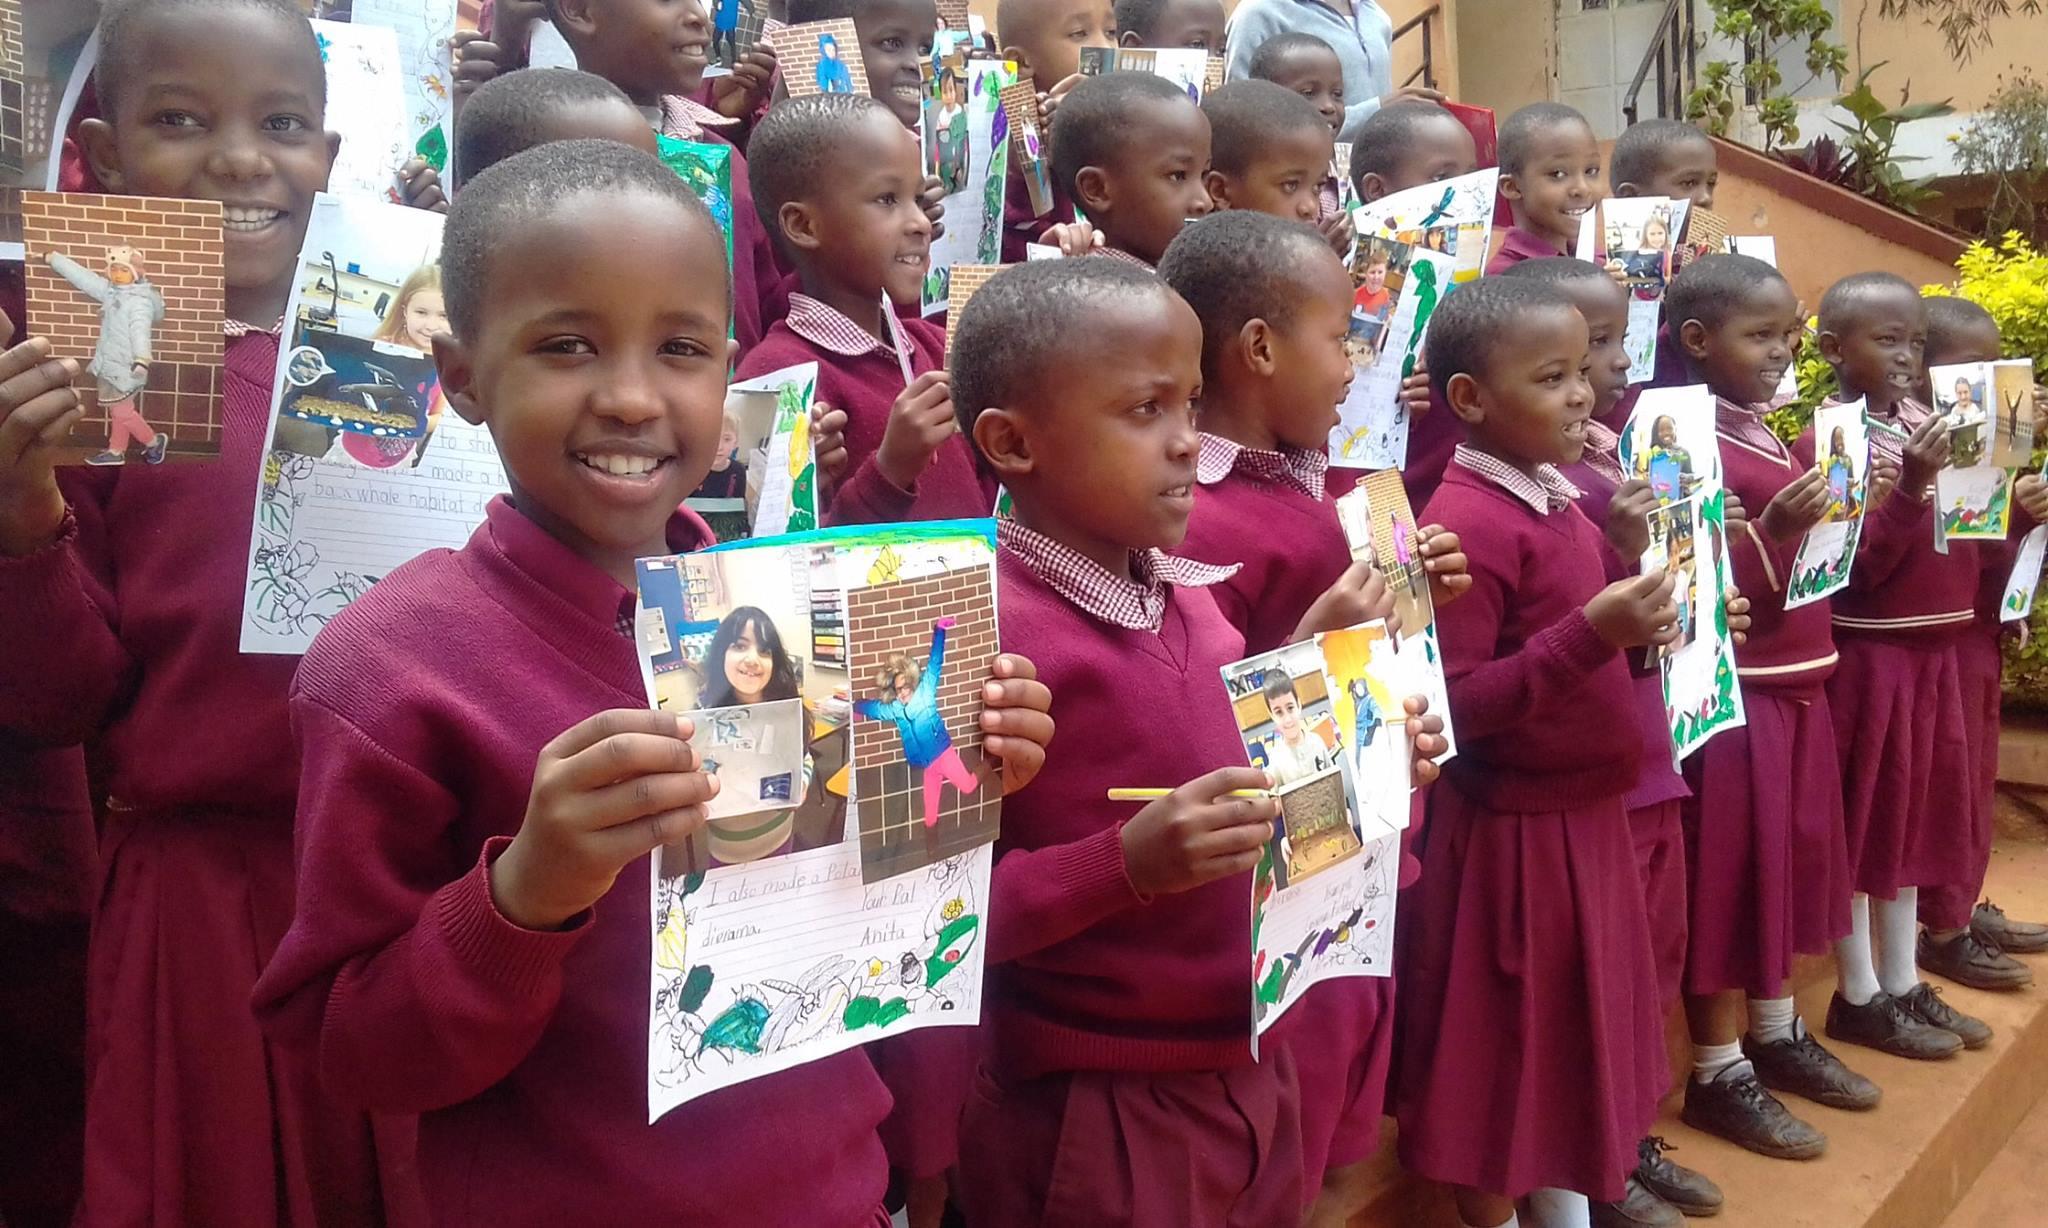 Sister School Program students in Tanzania